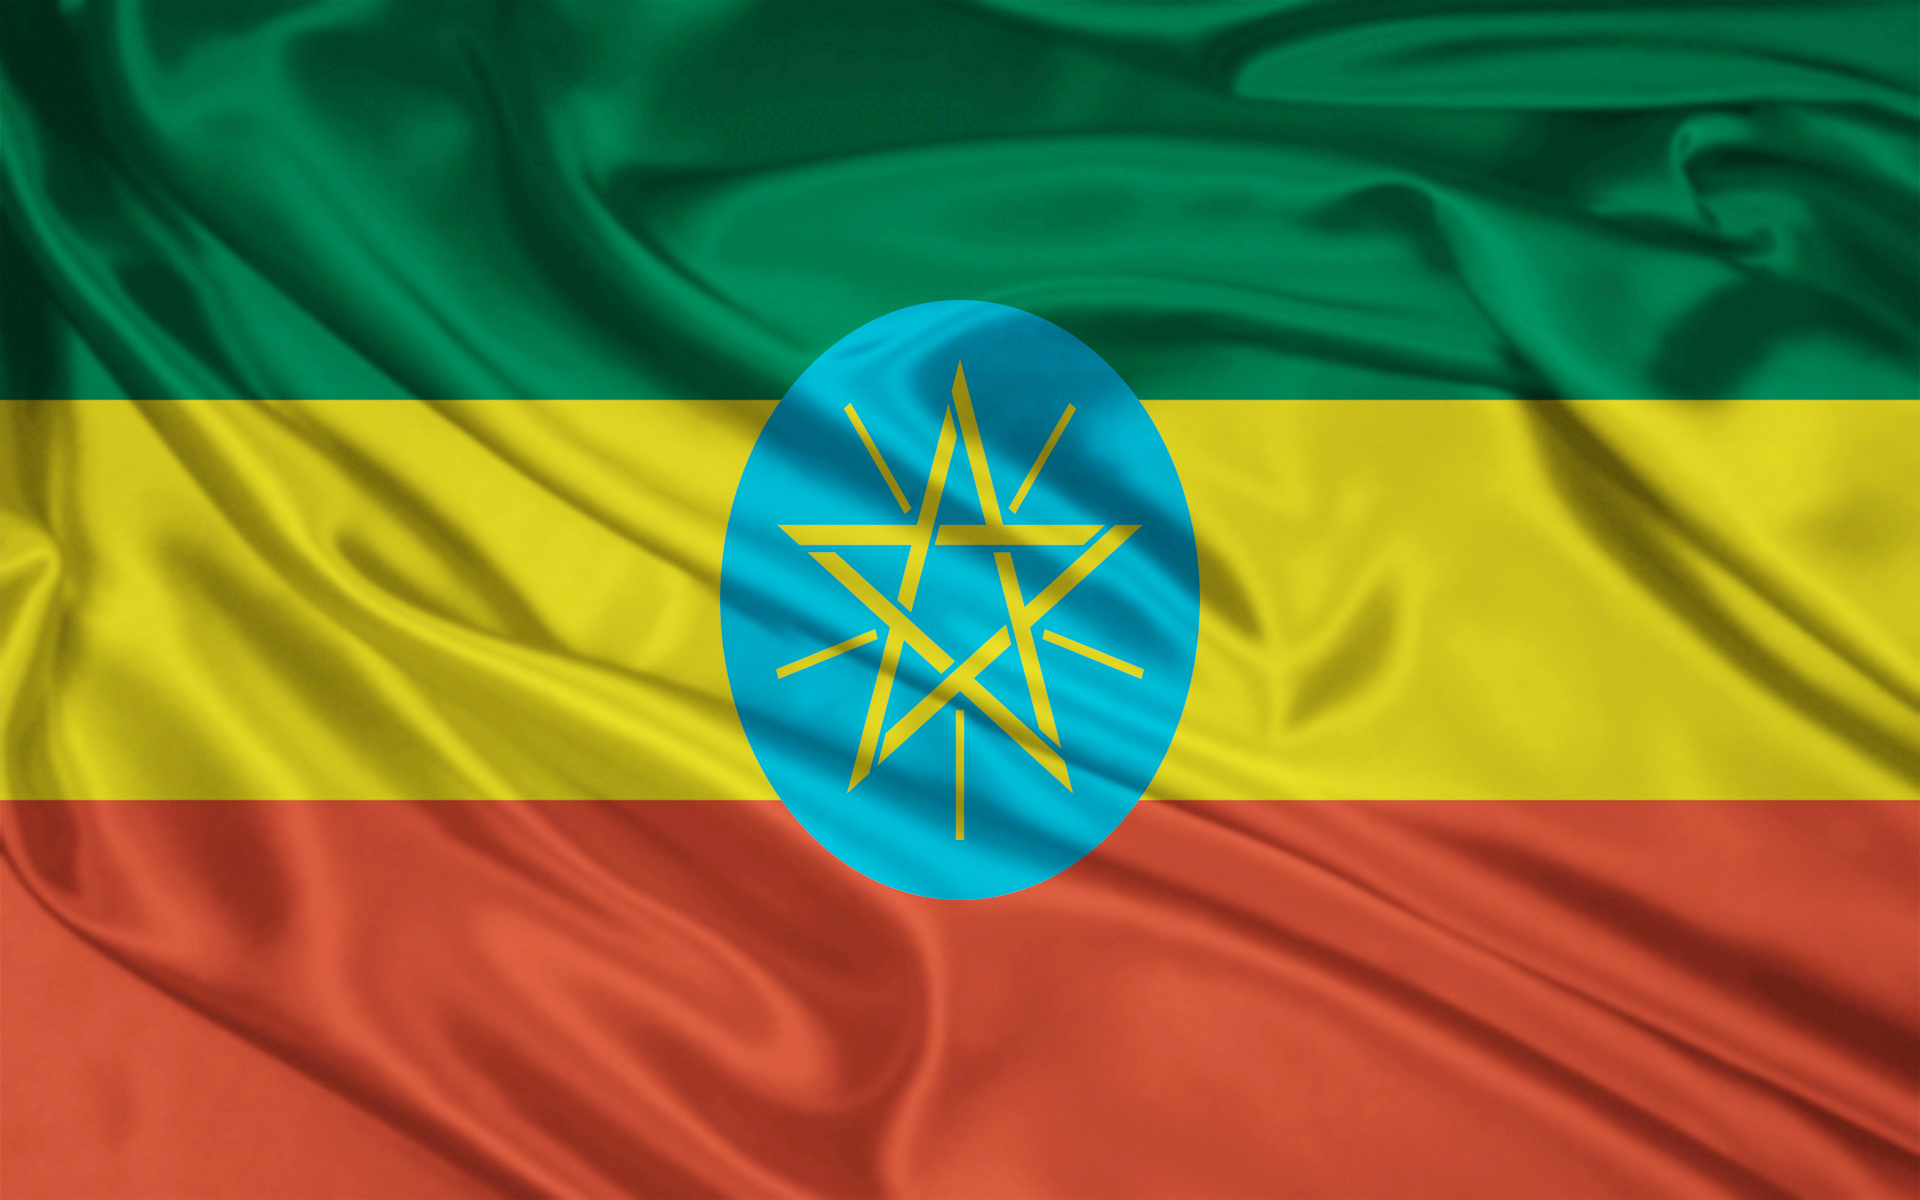 Etiopian-flag-2